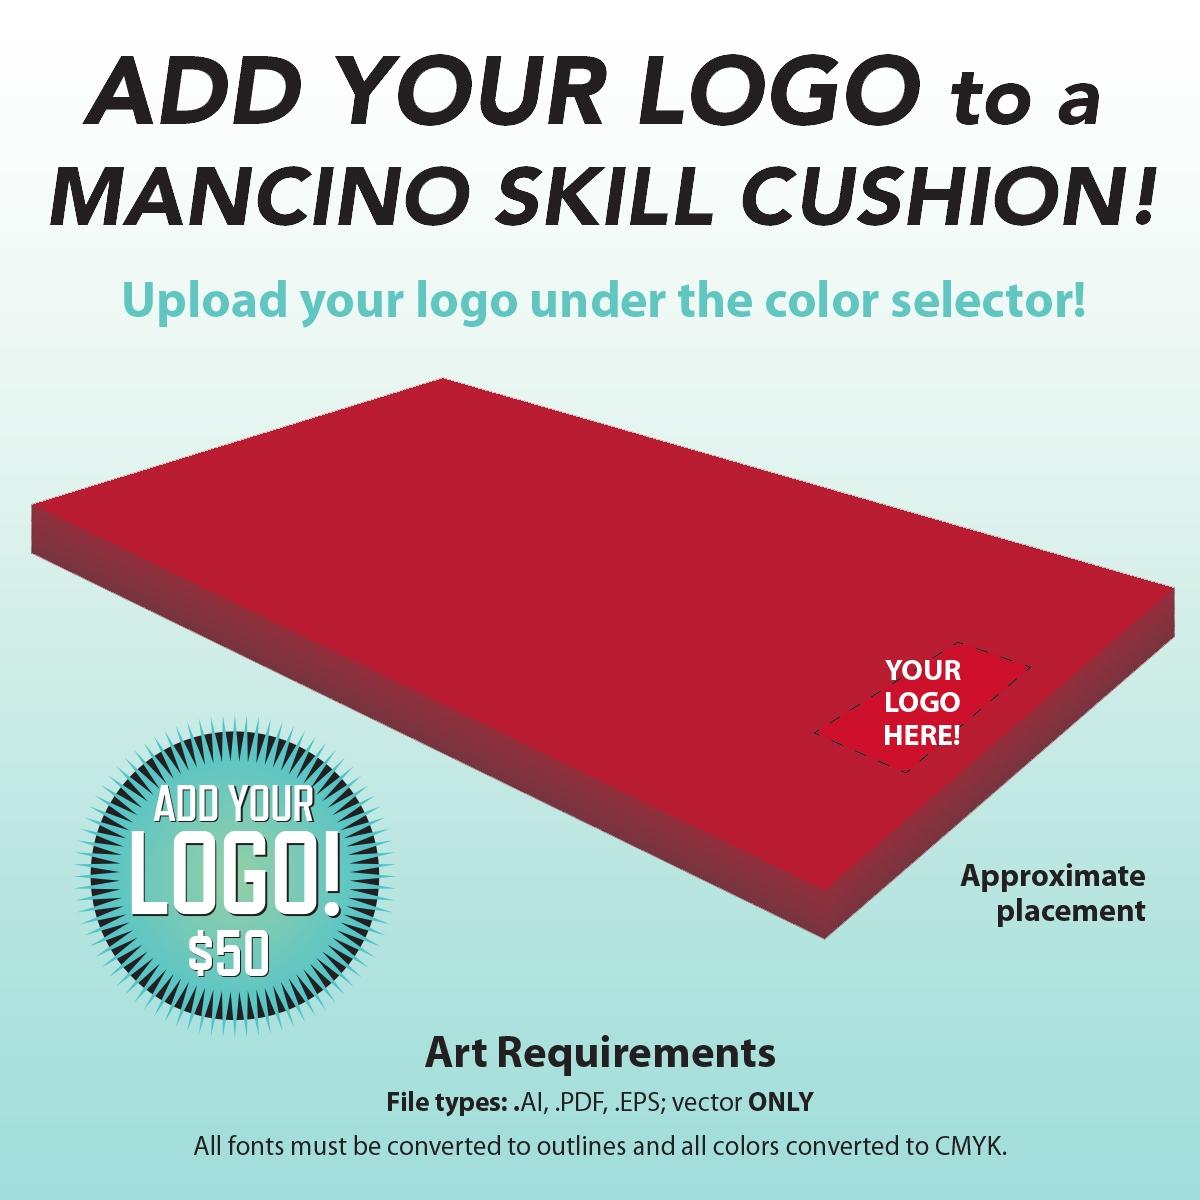 add your logo to a mancino skill cushion